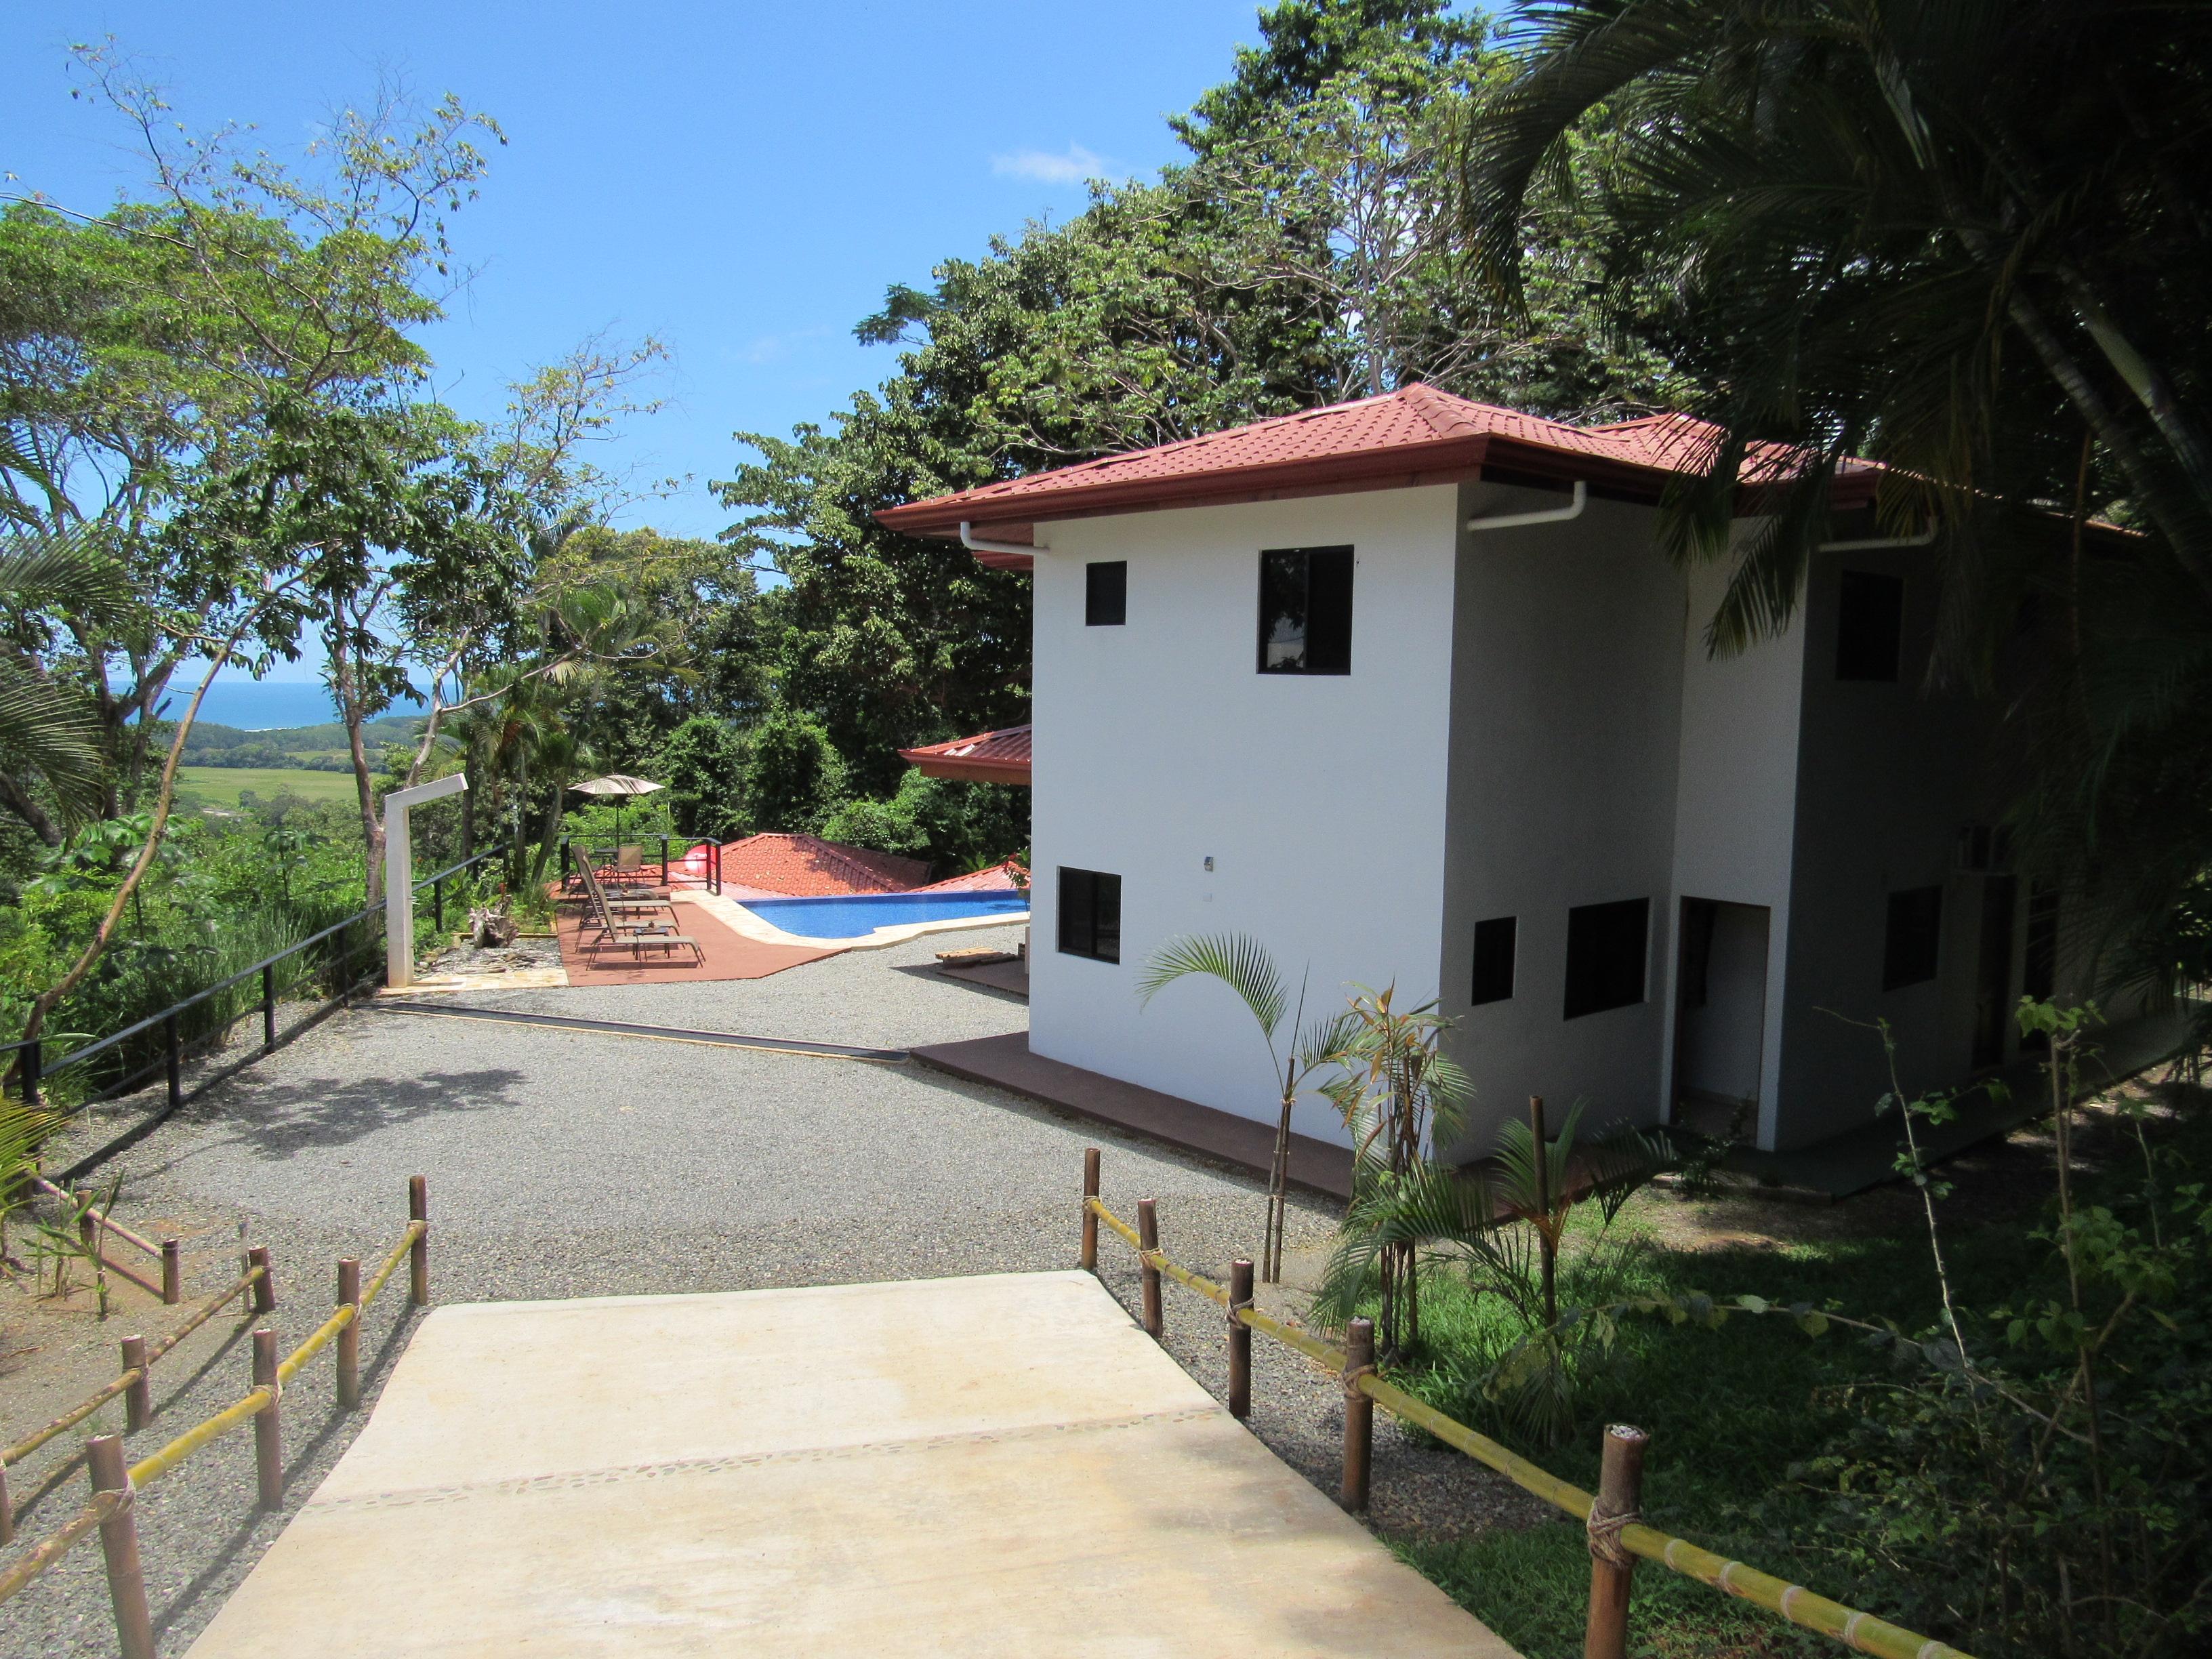 Hatillo-Costa-Rica-property-costaricarealestateHAT087-8.jpg